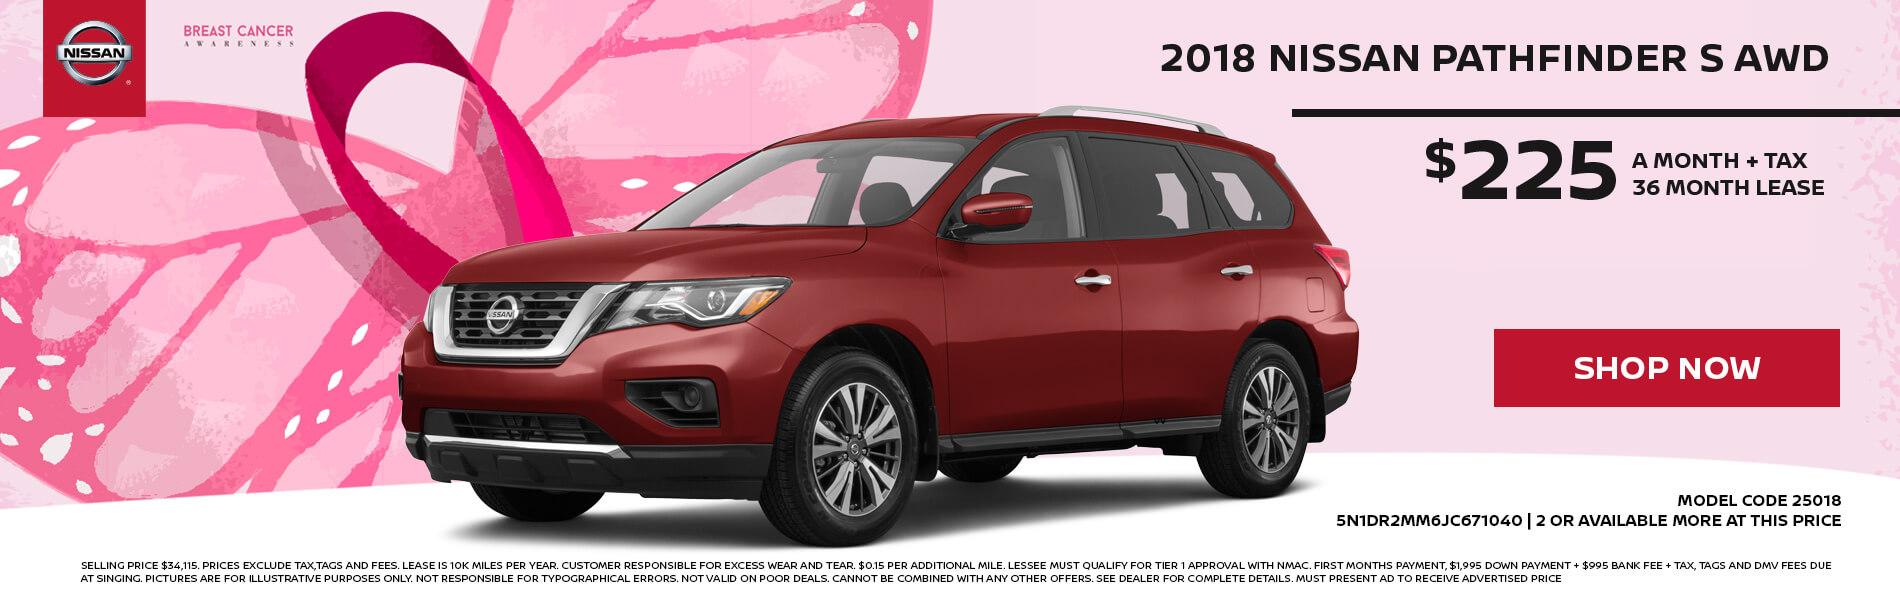 Nissan Pathfinder $225 Lease